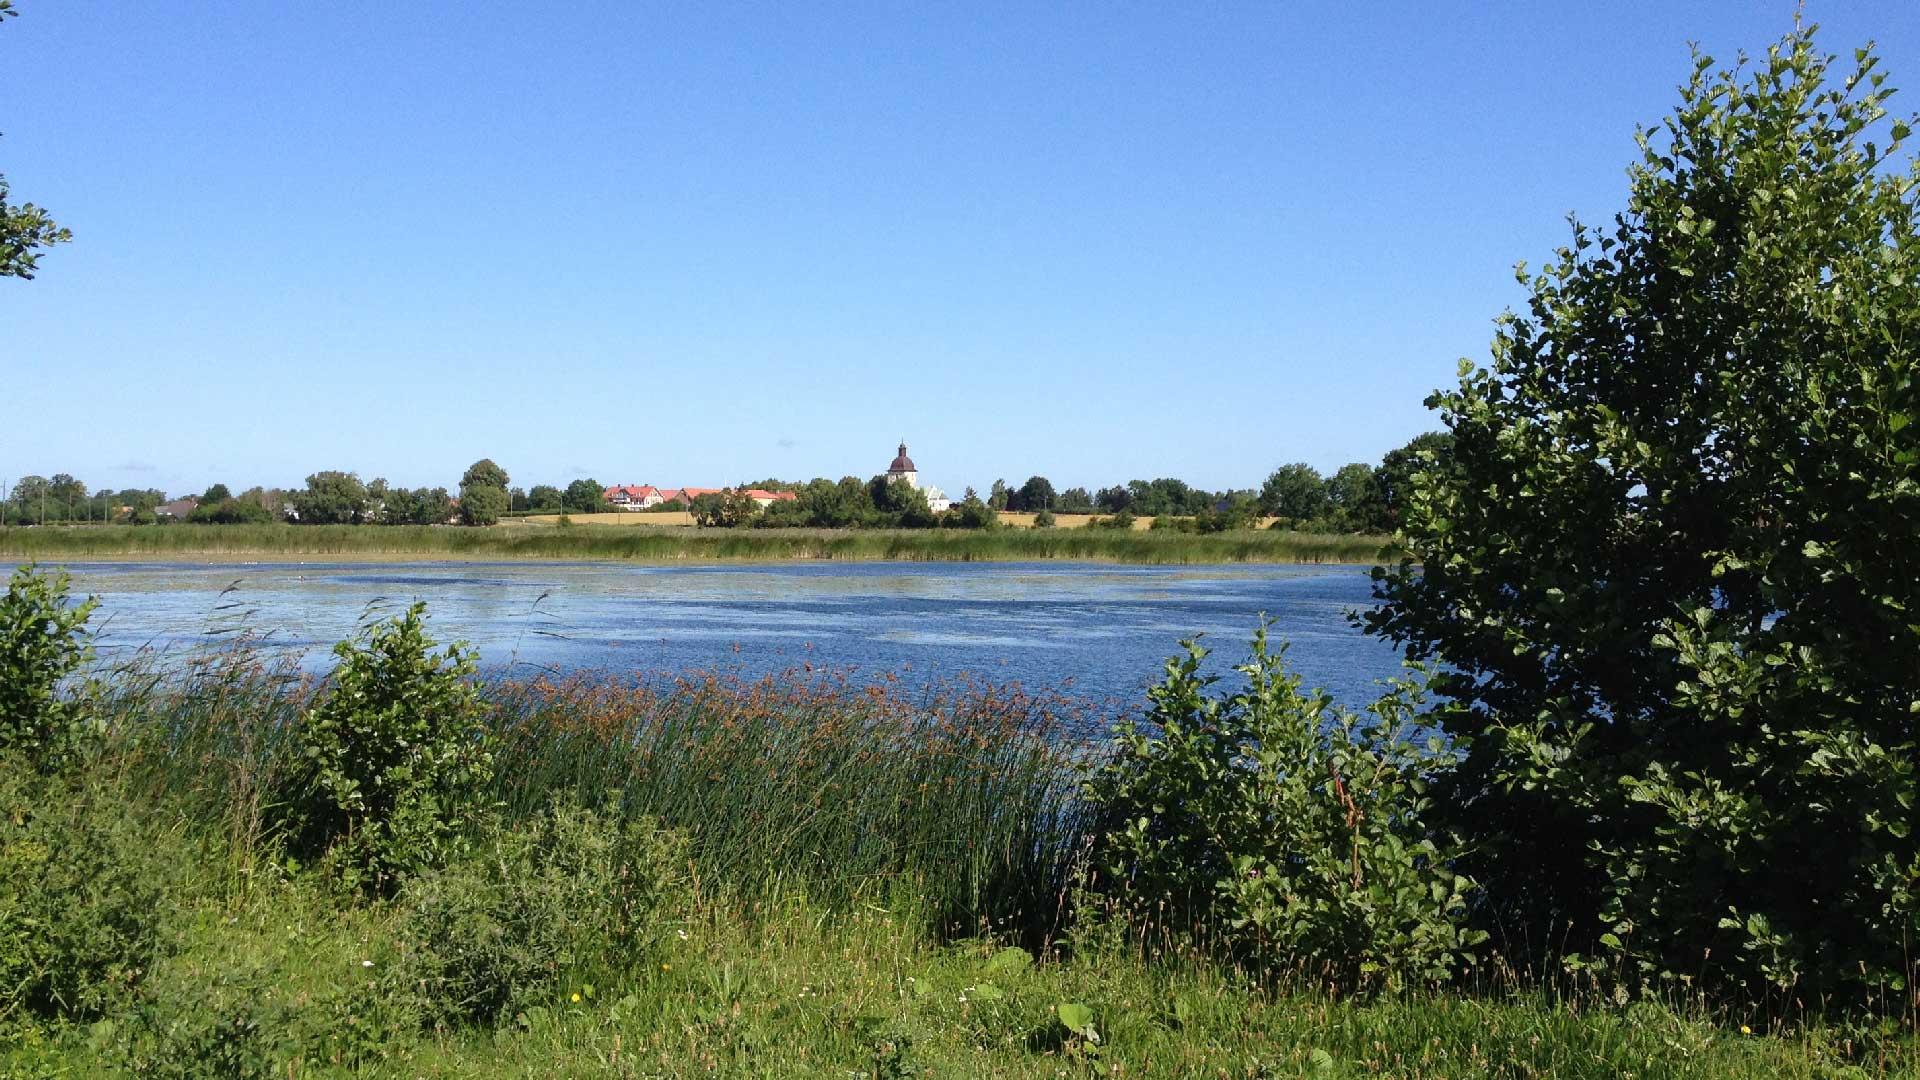 Hercules dammar med Viby kyrka i bakgrunden. Foto: Ebba Trolle